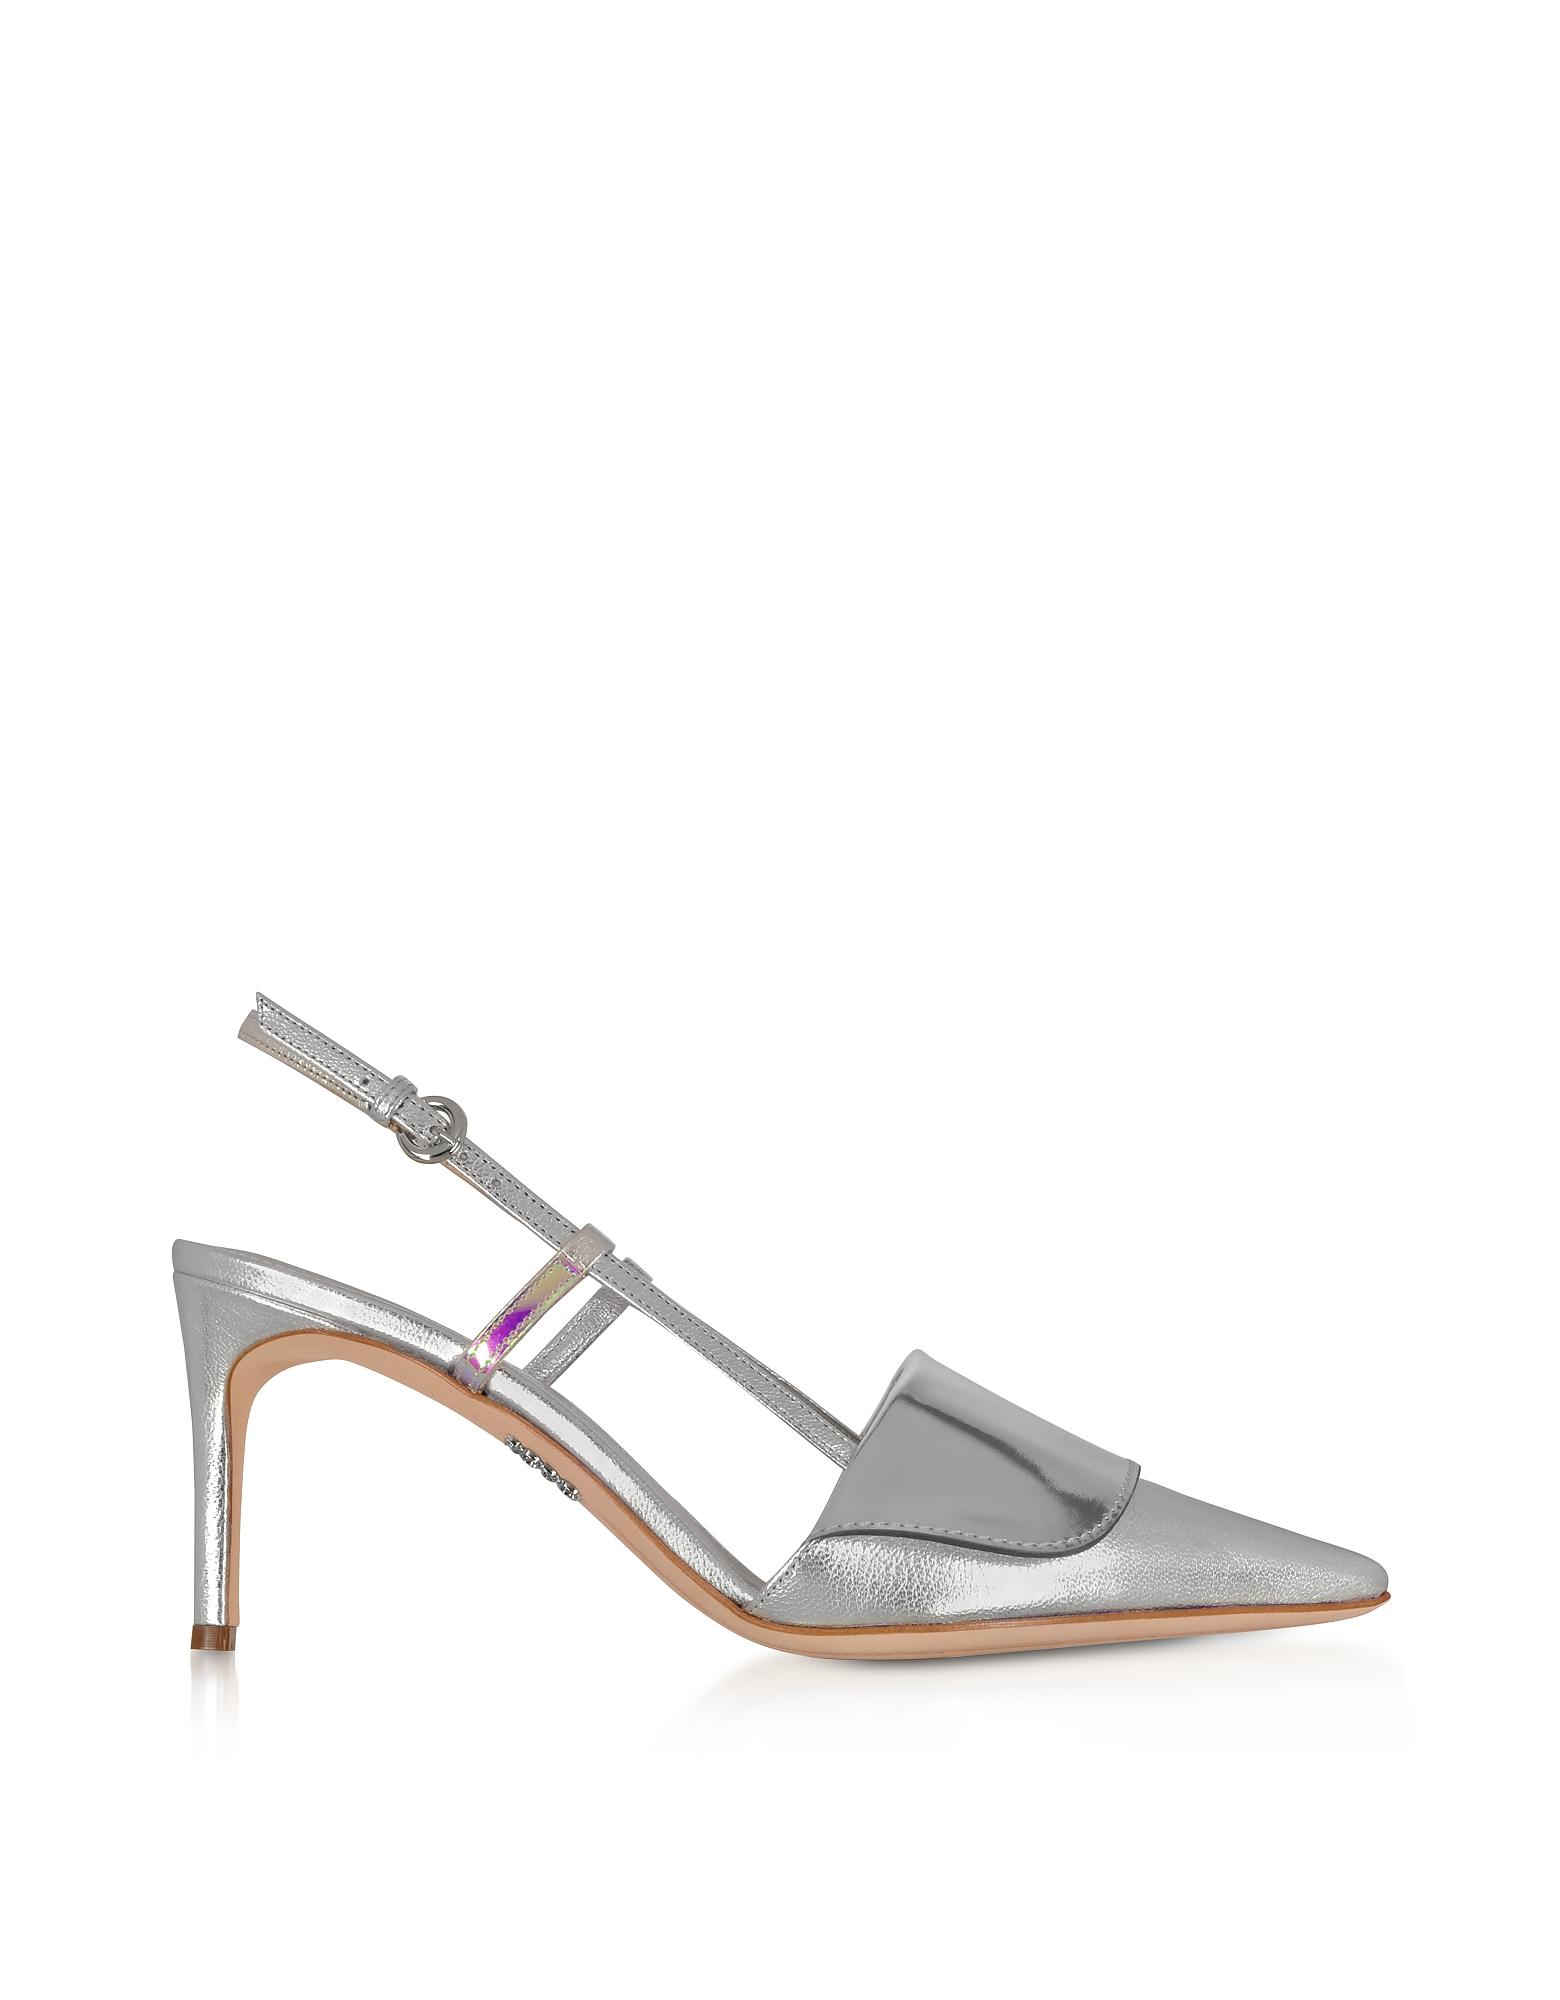 Rodo Designer Shoes, Silver Leather Women